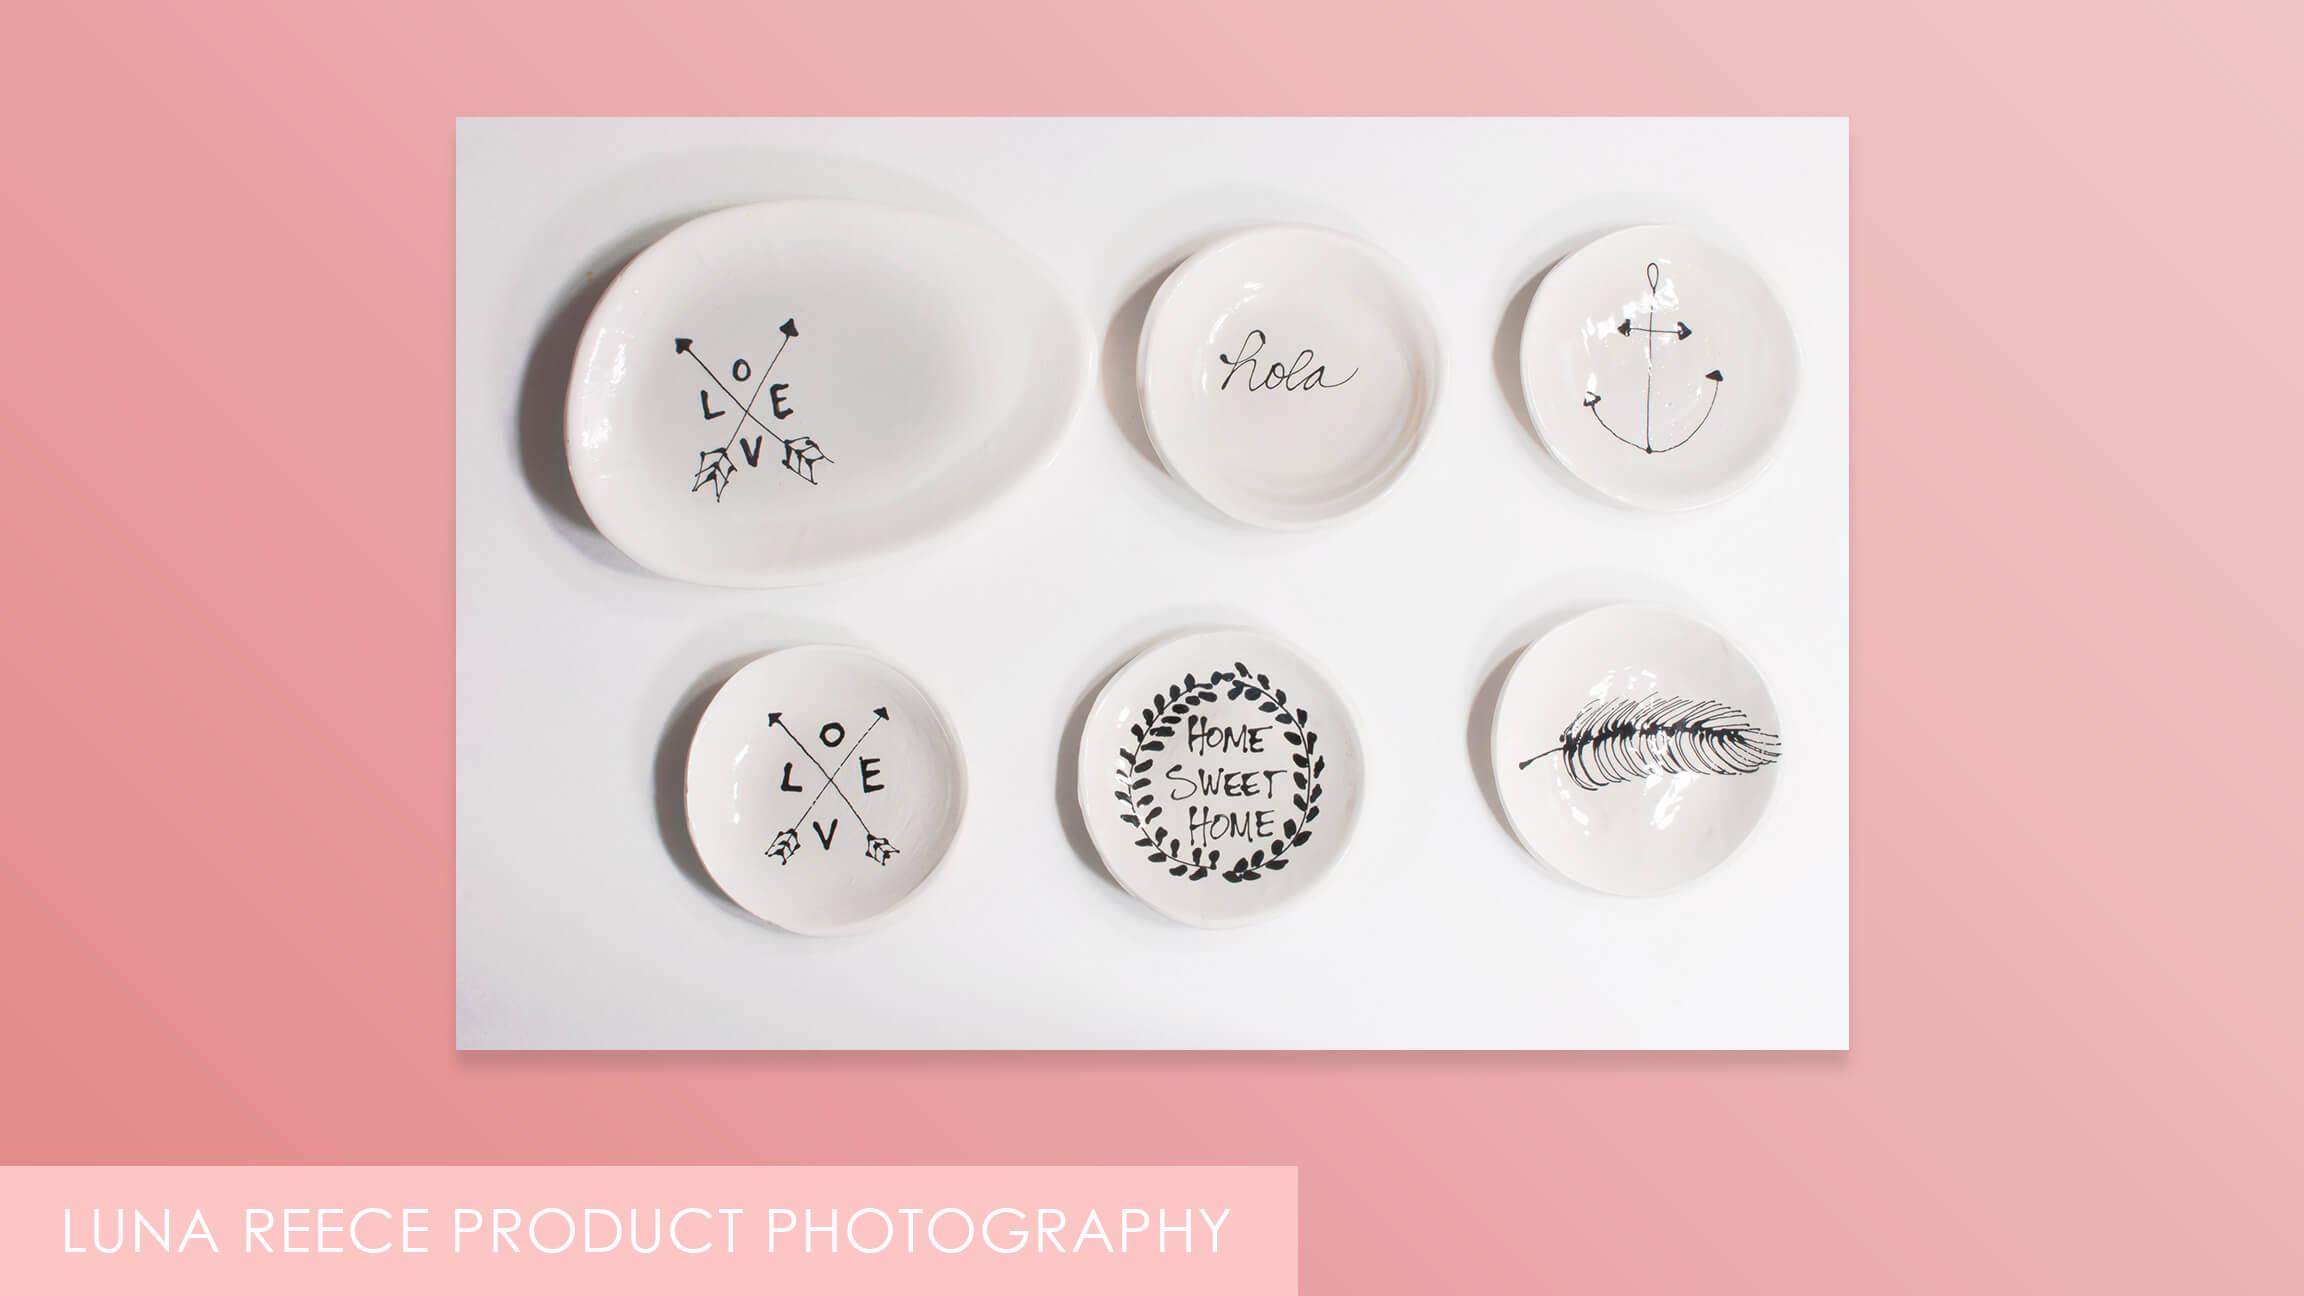 the-four-design-luna-reece-product-photography-4.jpg